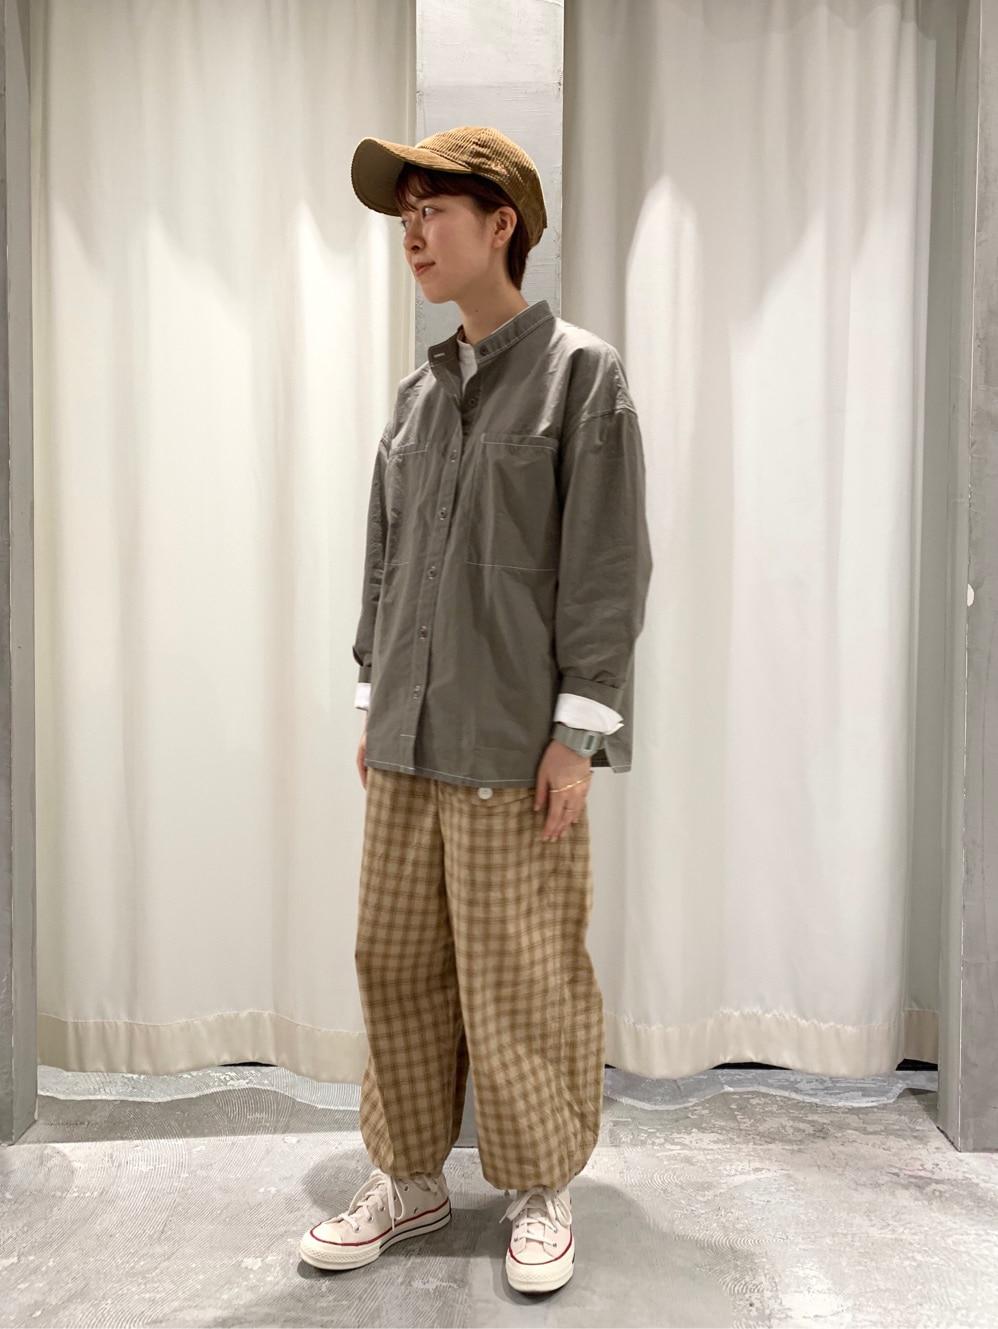 - CHILD WOMAN CHILD WOMAN , PAR ICI ルミネ横浜 身長:158cm 2020.09.25